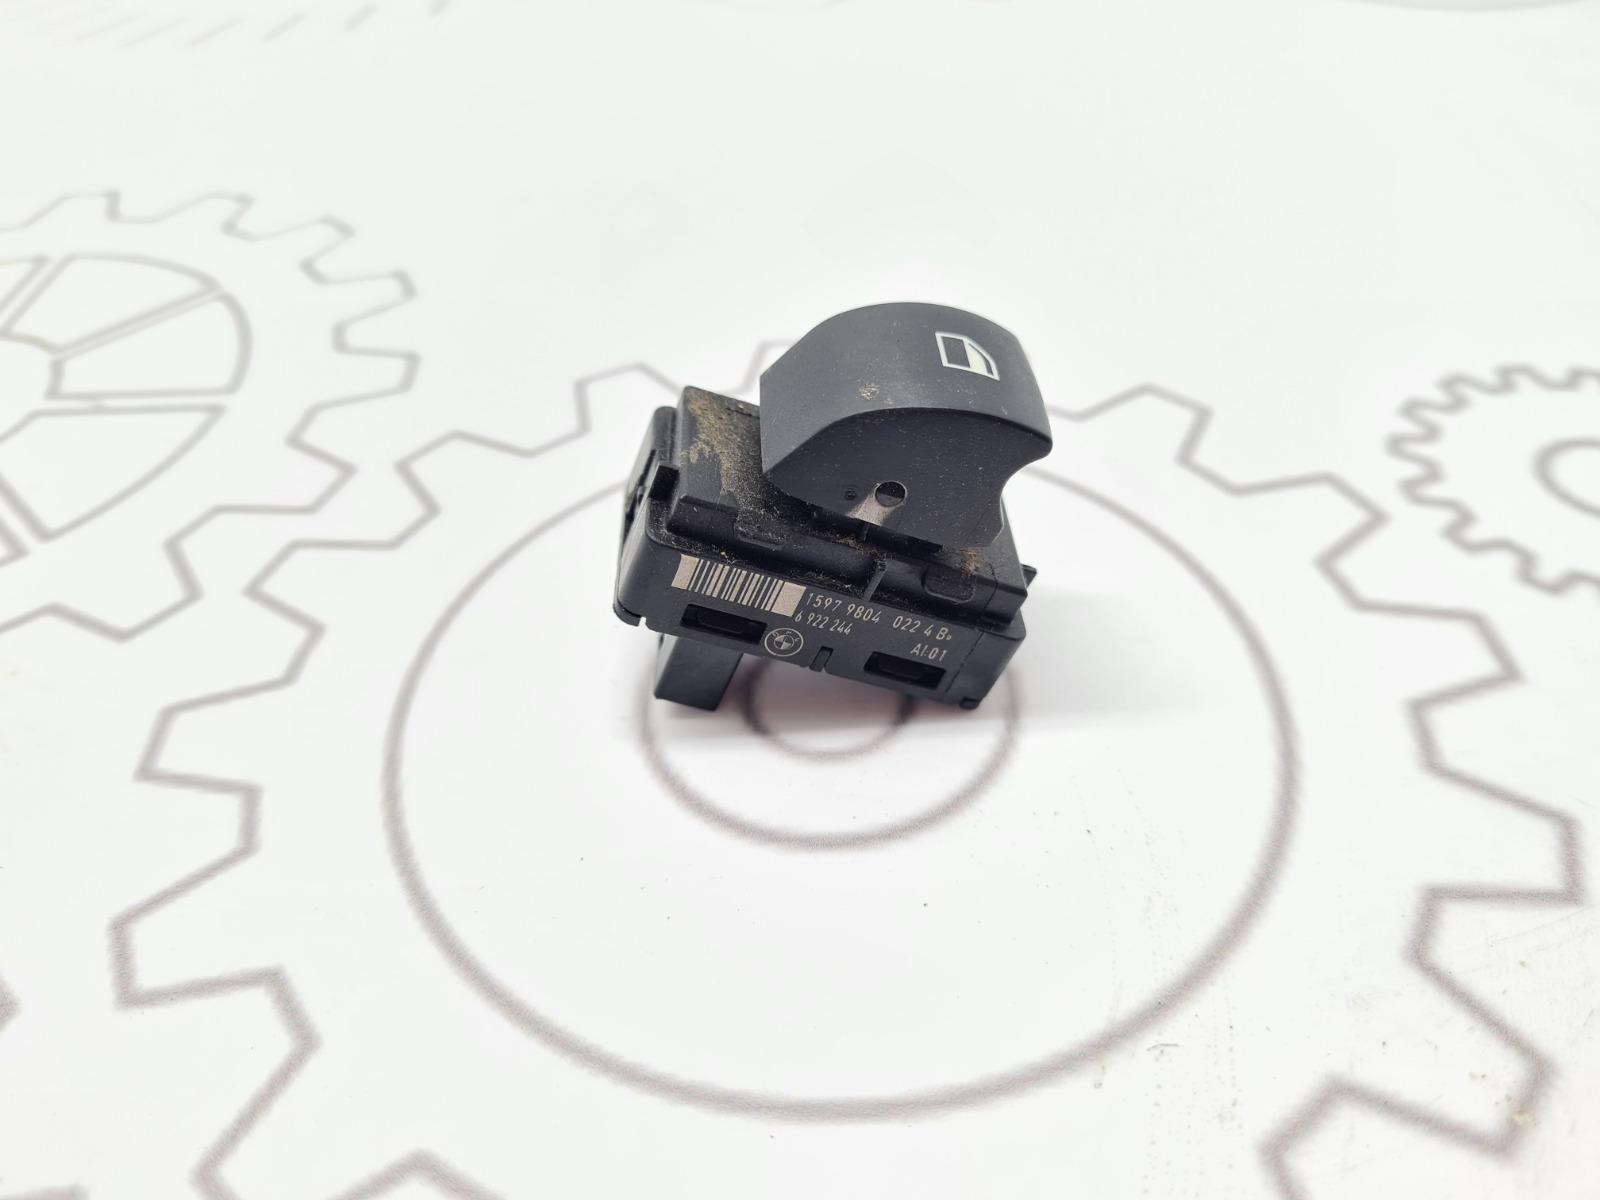 Кнопка стеклоподъемника Bmw 5 E60 2.5 I 2004 (б/у)